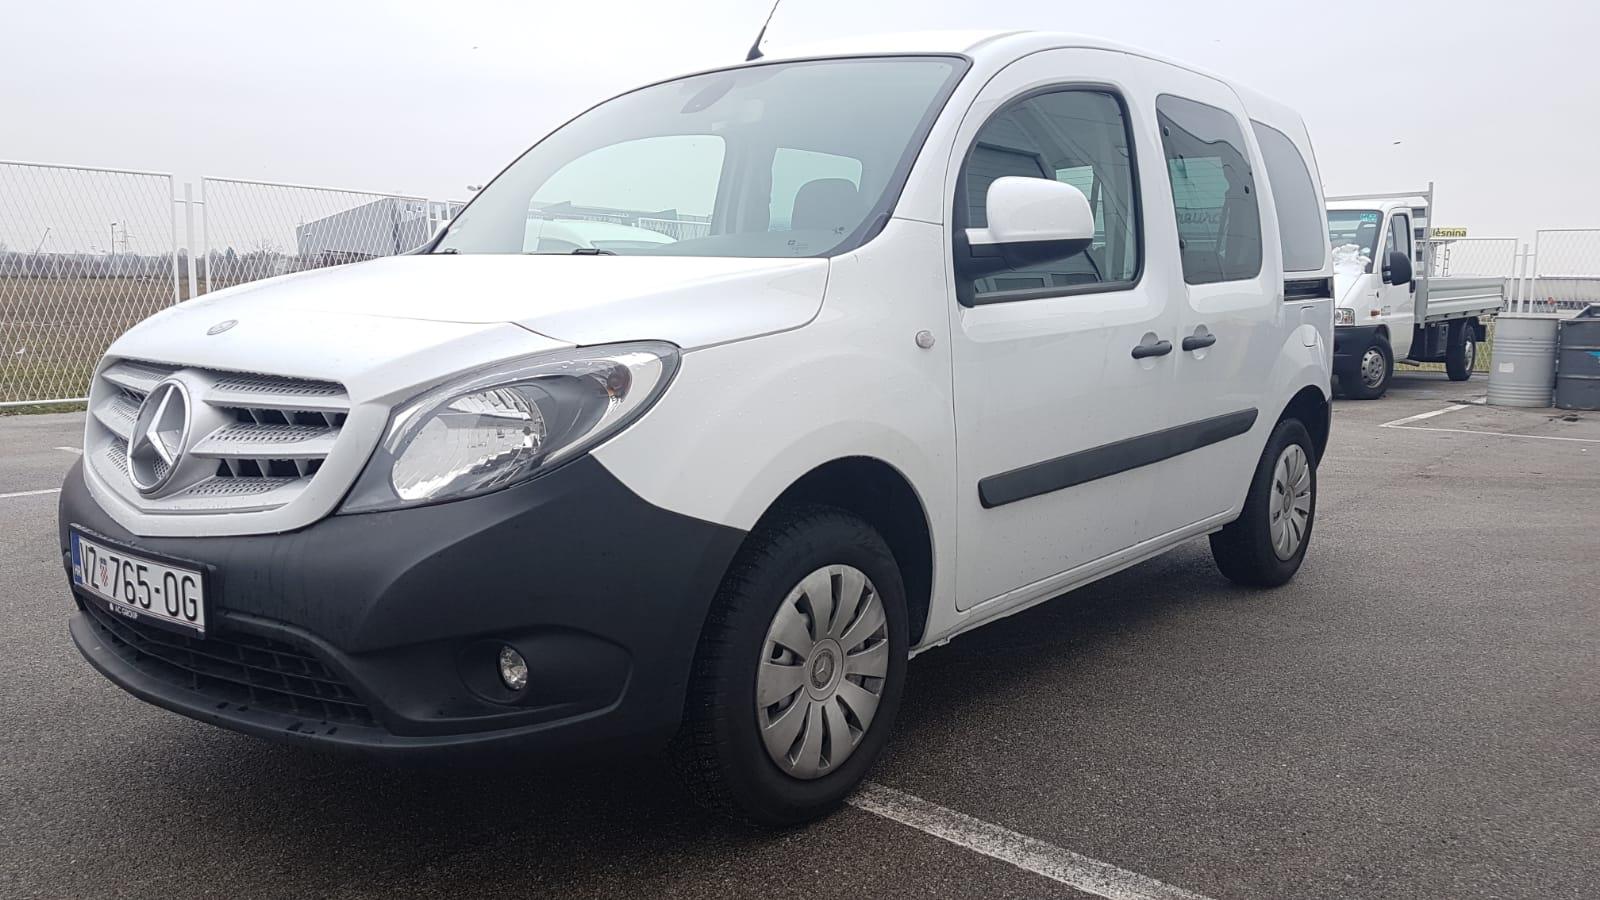 Mercedes Citan (VŽ 765-OG) 1